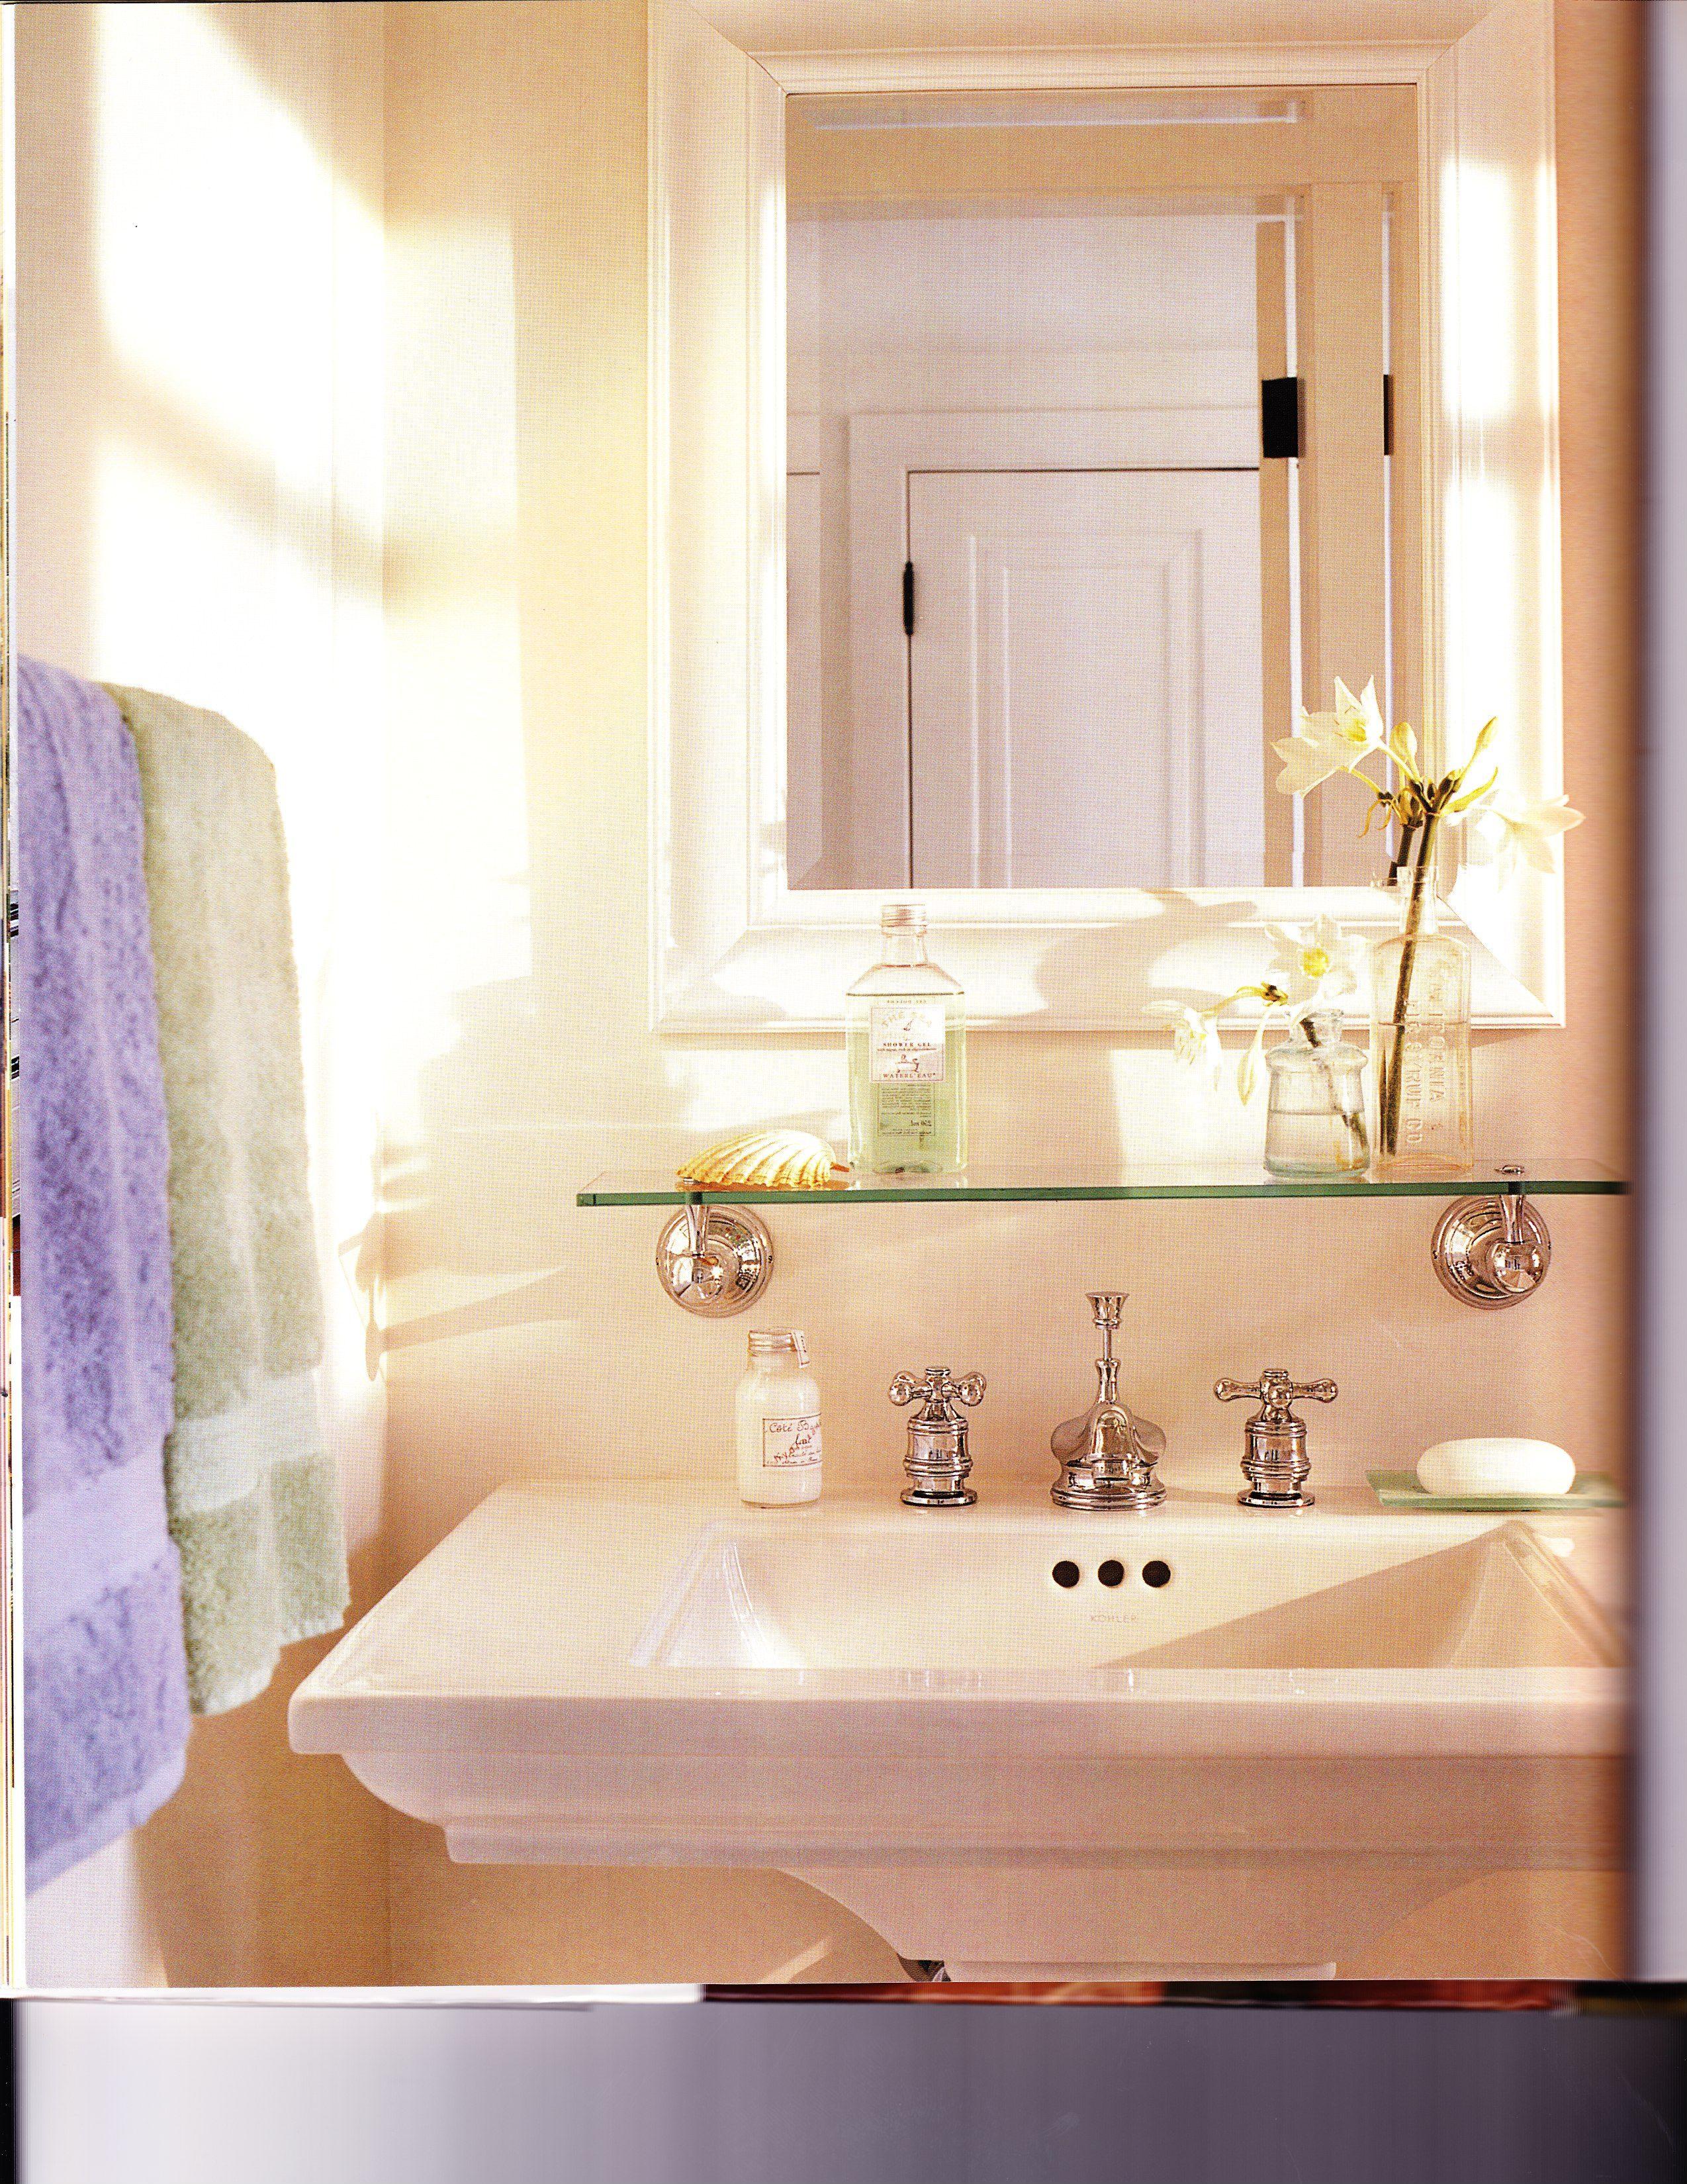 Powder Room Pedestal Sink Glass Shelf Pedestal Sink Bathroom Beautiful Bathrooms Powder Room